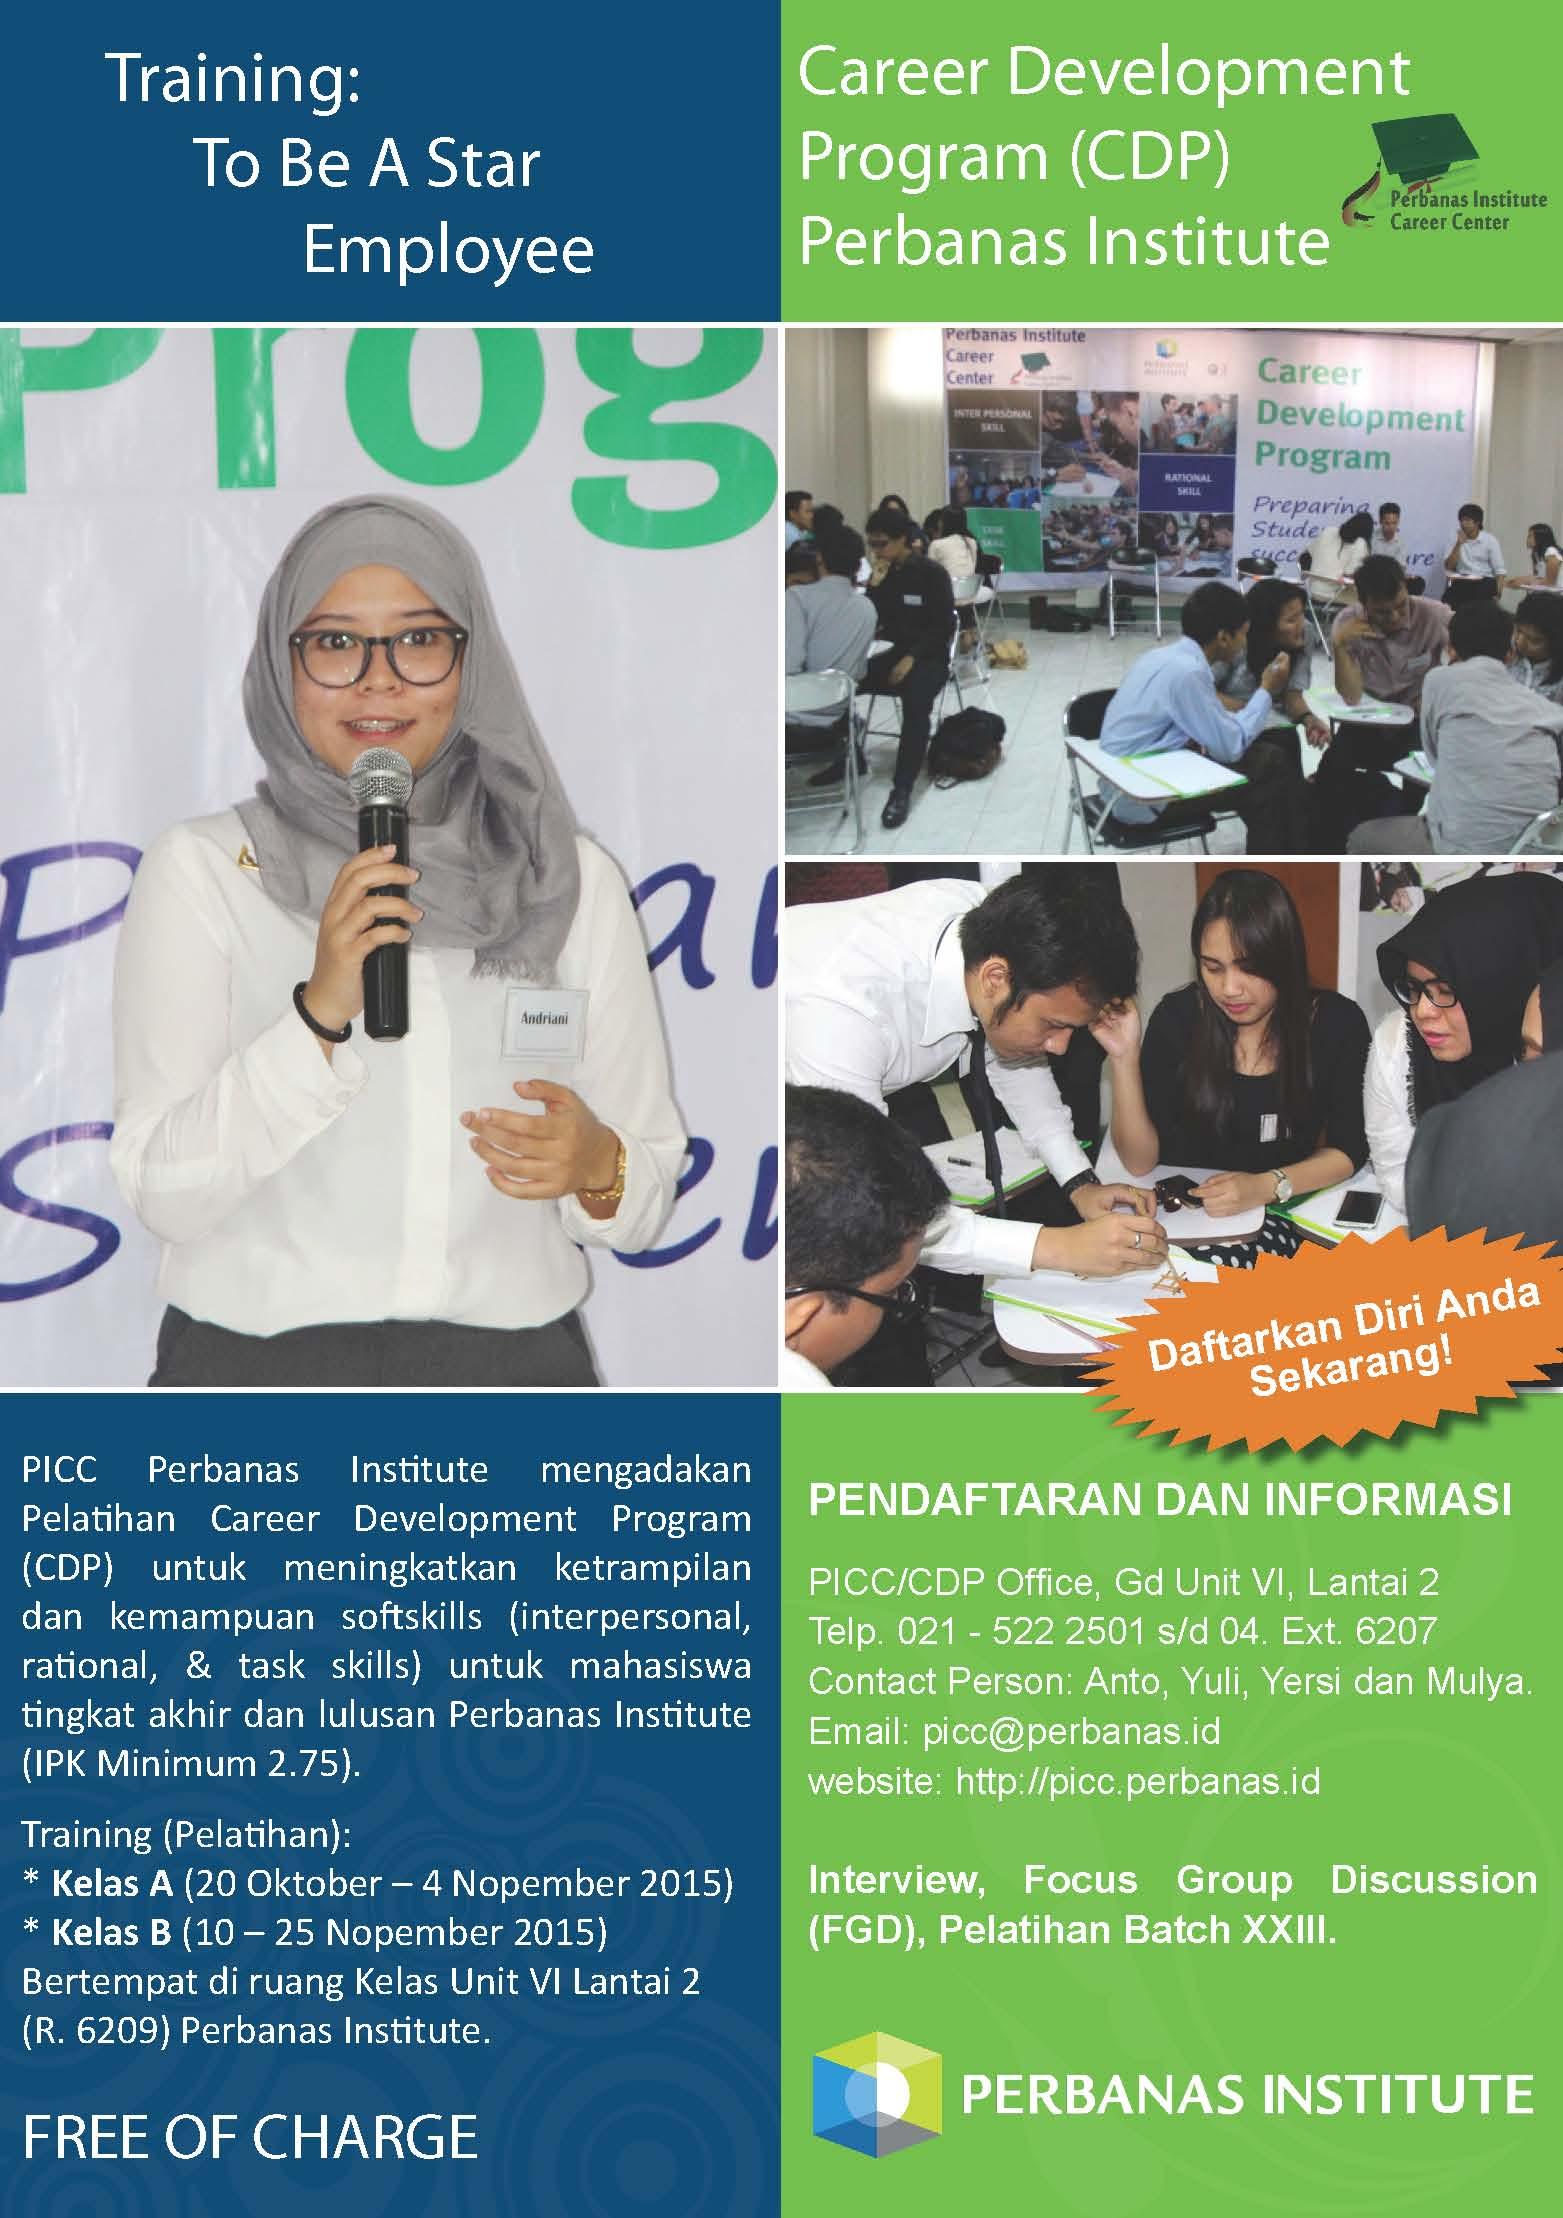 Training Career Development Program (CDP) Batch XXIII